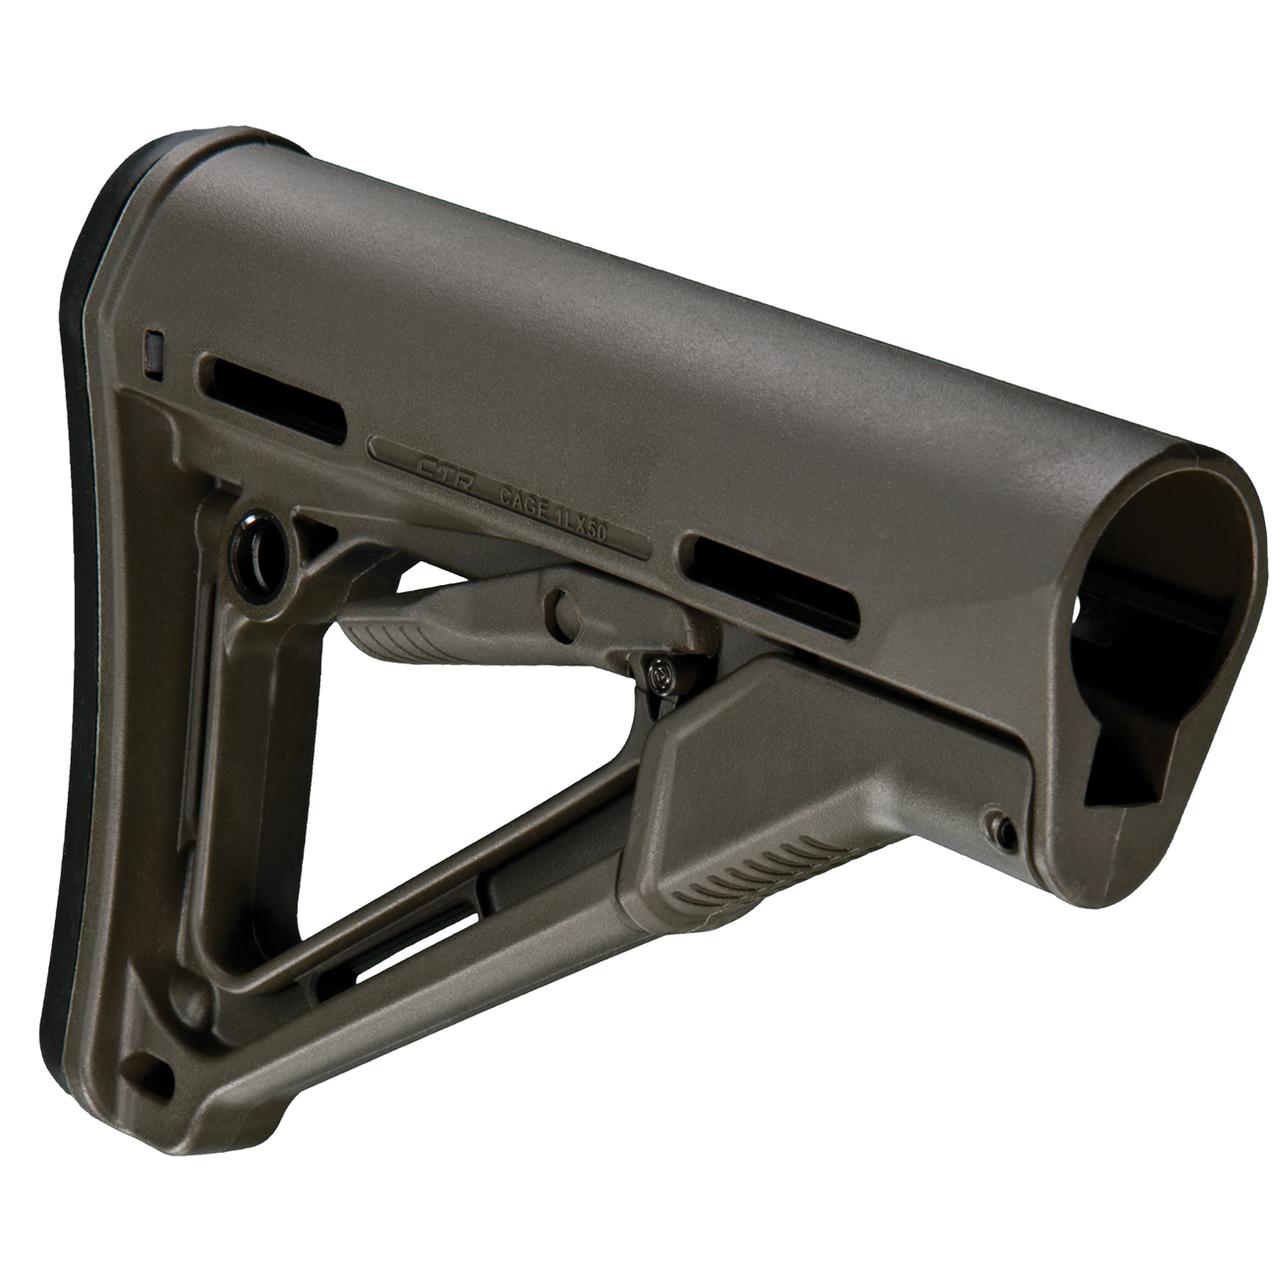 Magpul CTR Carbine Stock Mil-Spec Olive Drab